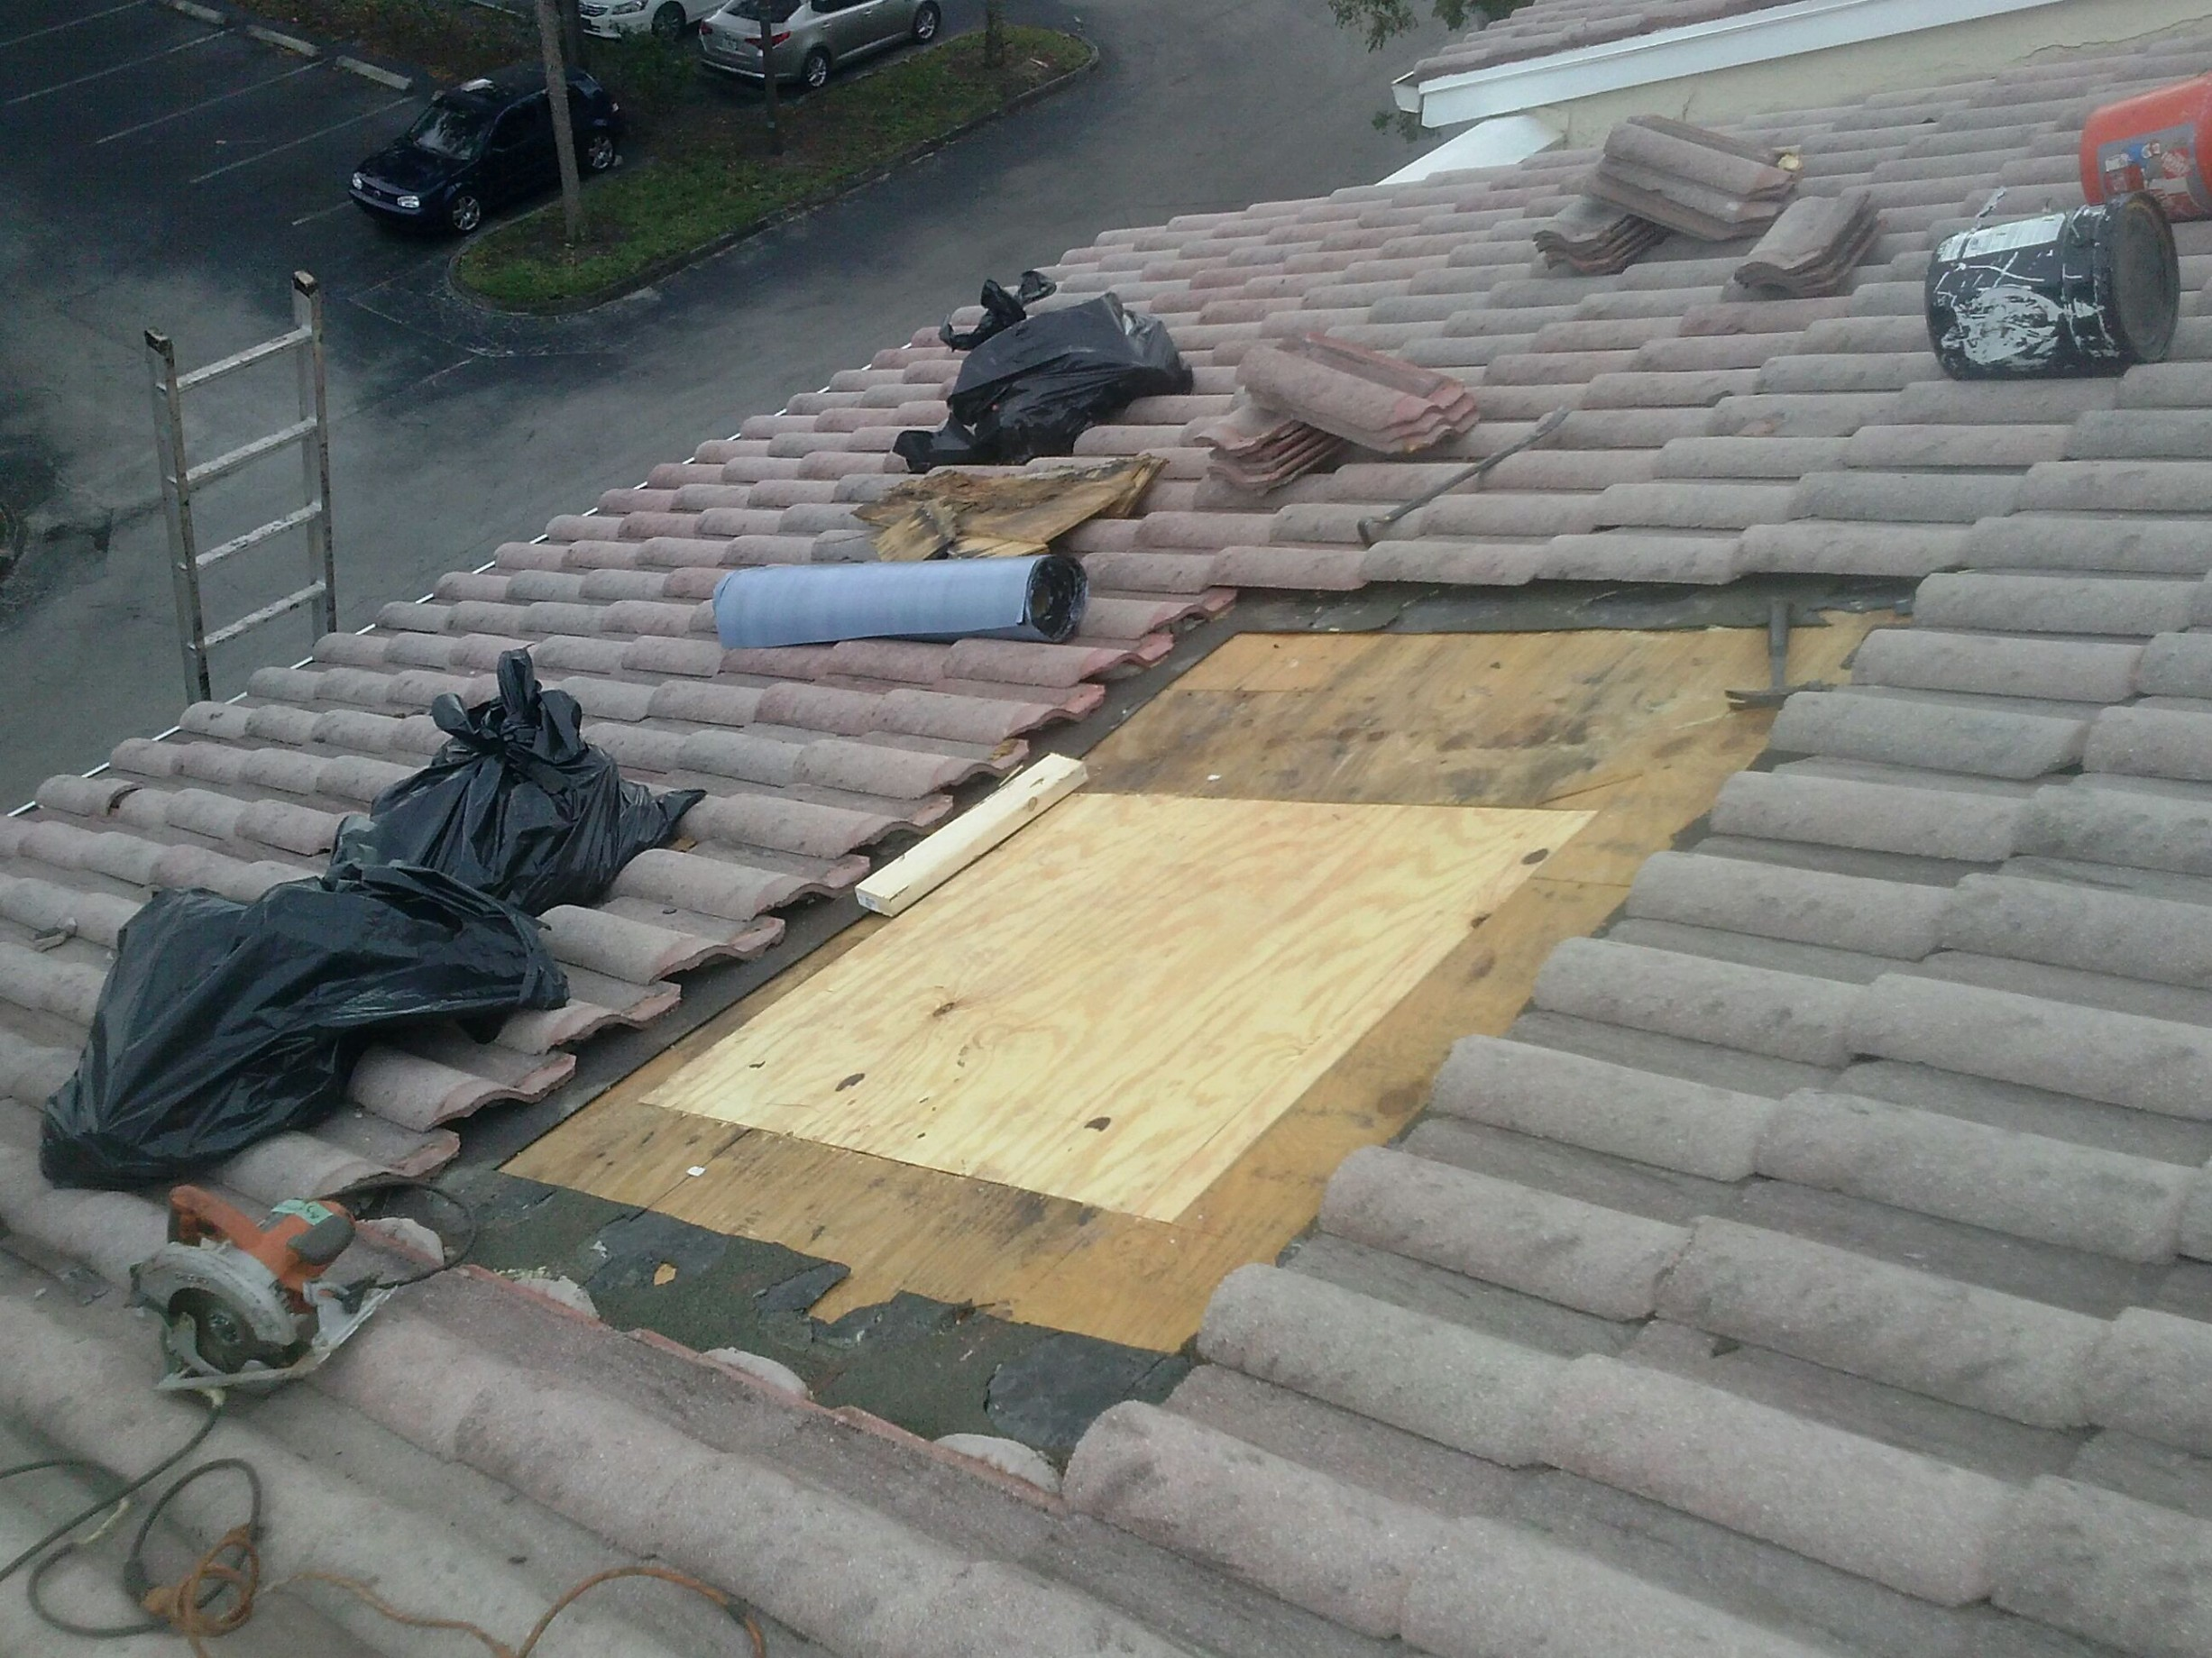 Change Rotten Wood. Tile Roof Repair